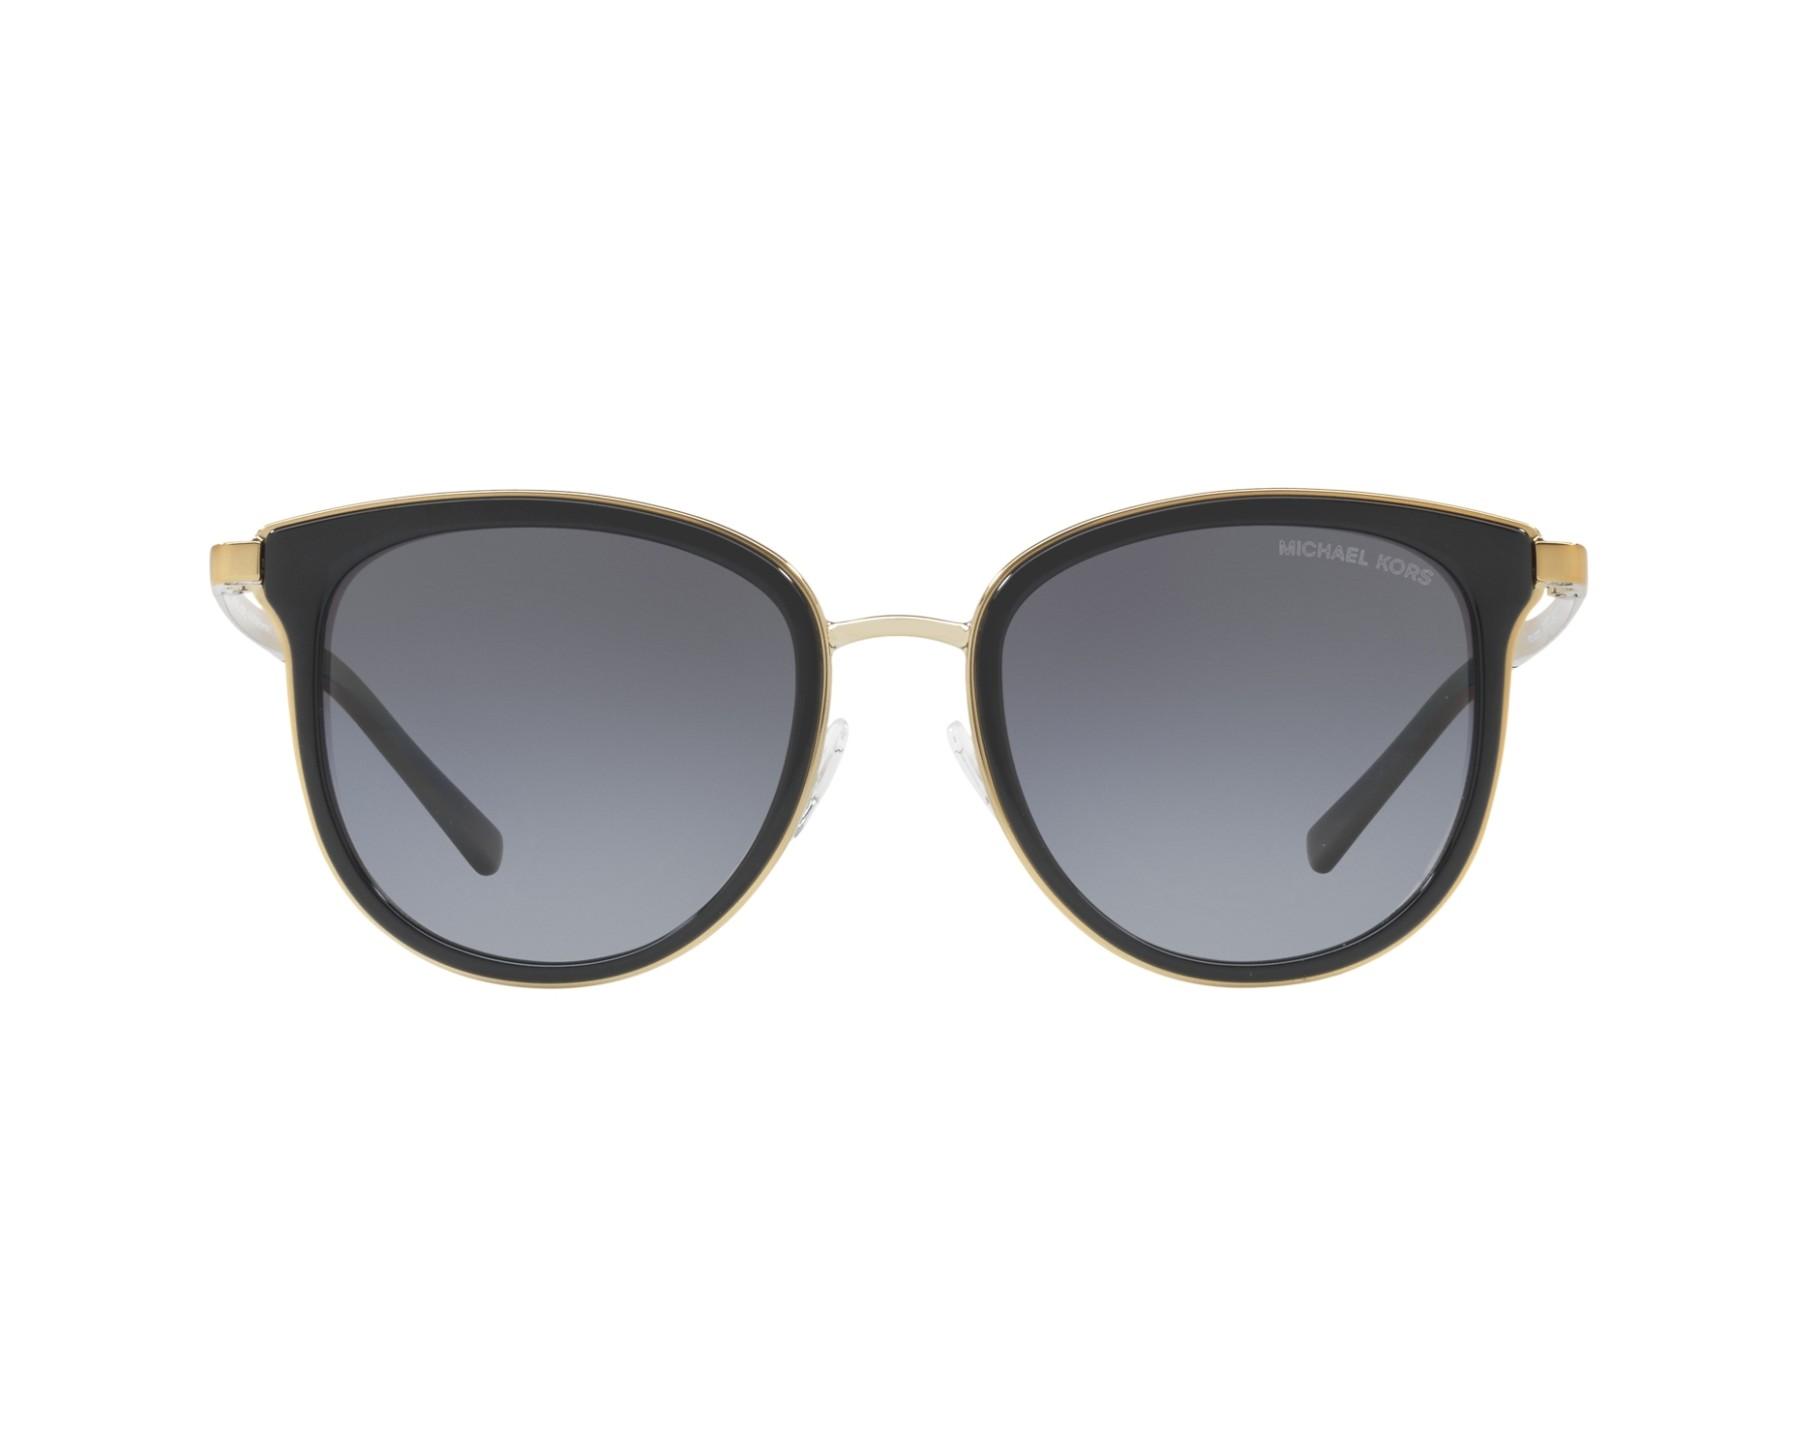 a2e835b333171 Sunglasses Michael Kors MK-1010 1100T3 54-20 Black Gold 360 degree view 1